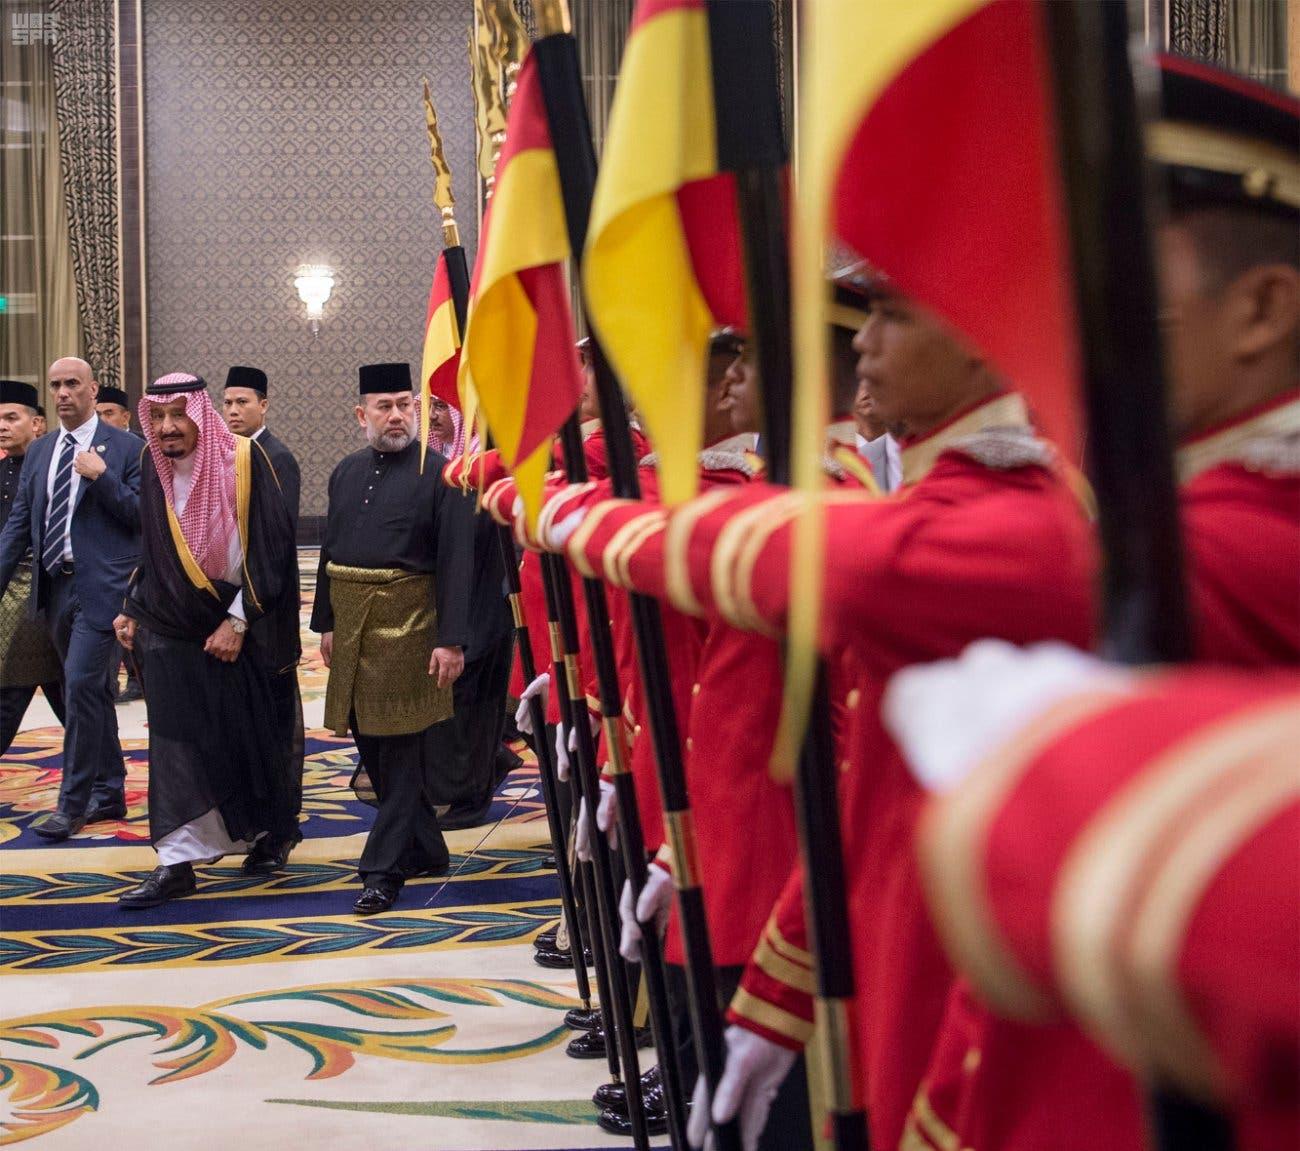 Saudi King Salman in Malaysia: We stand fully behind Islamic causes